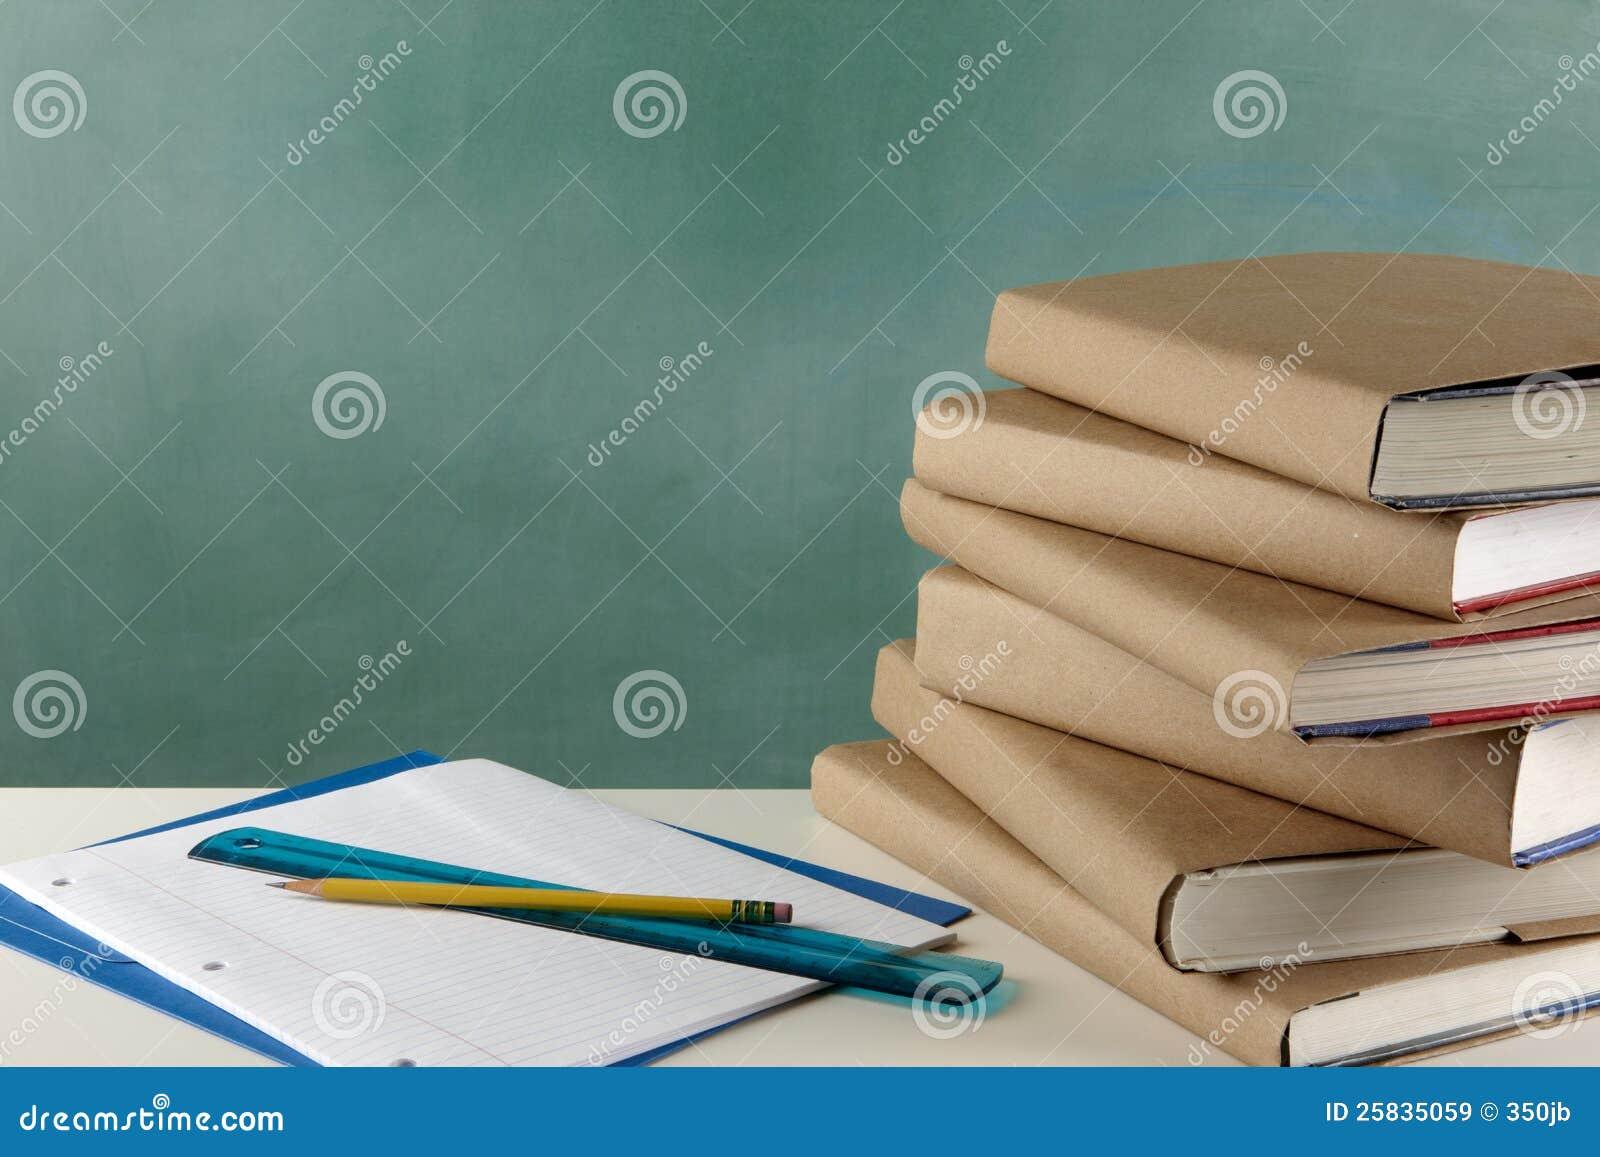 Schoolbooks, loose leaf paper, ruler and pencil